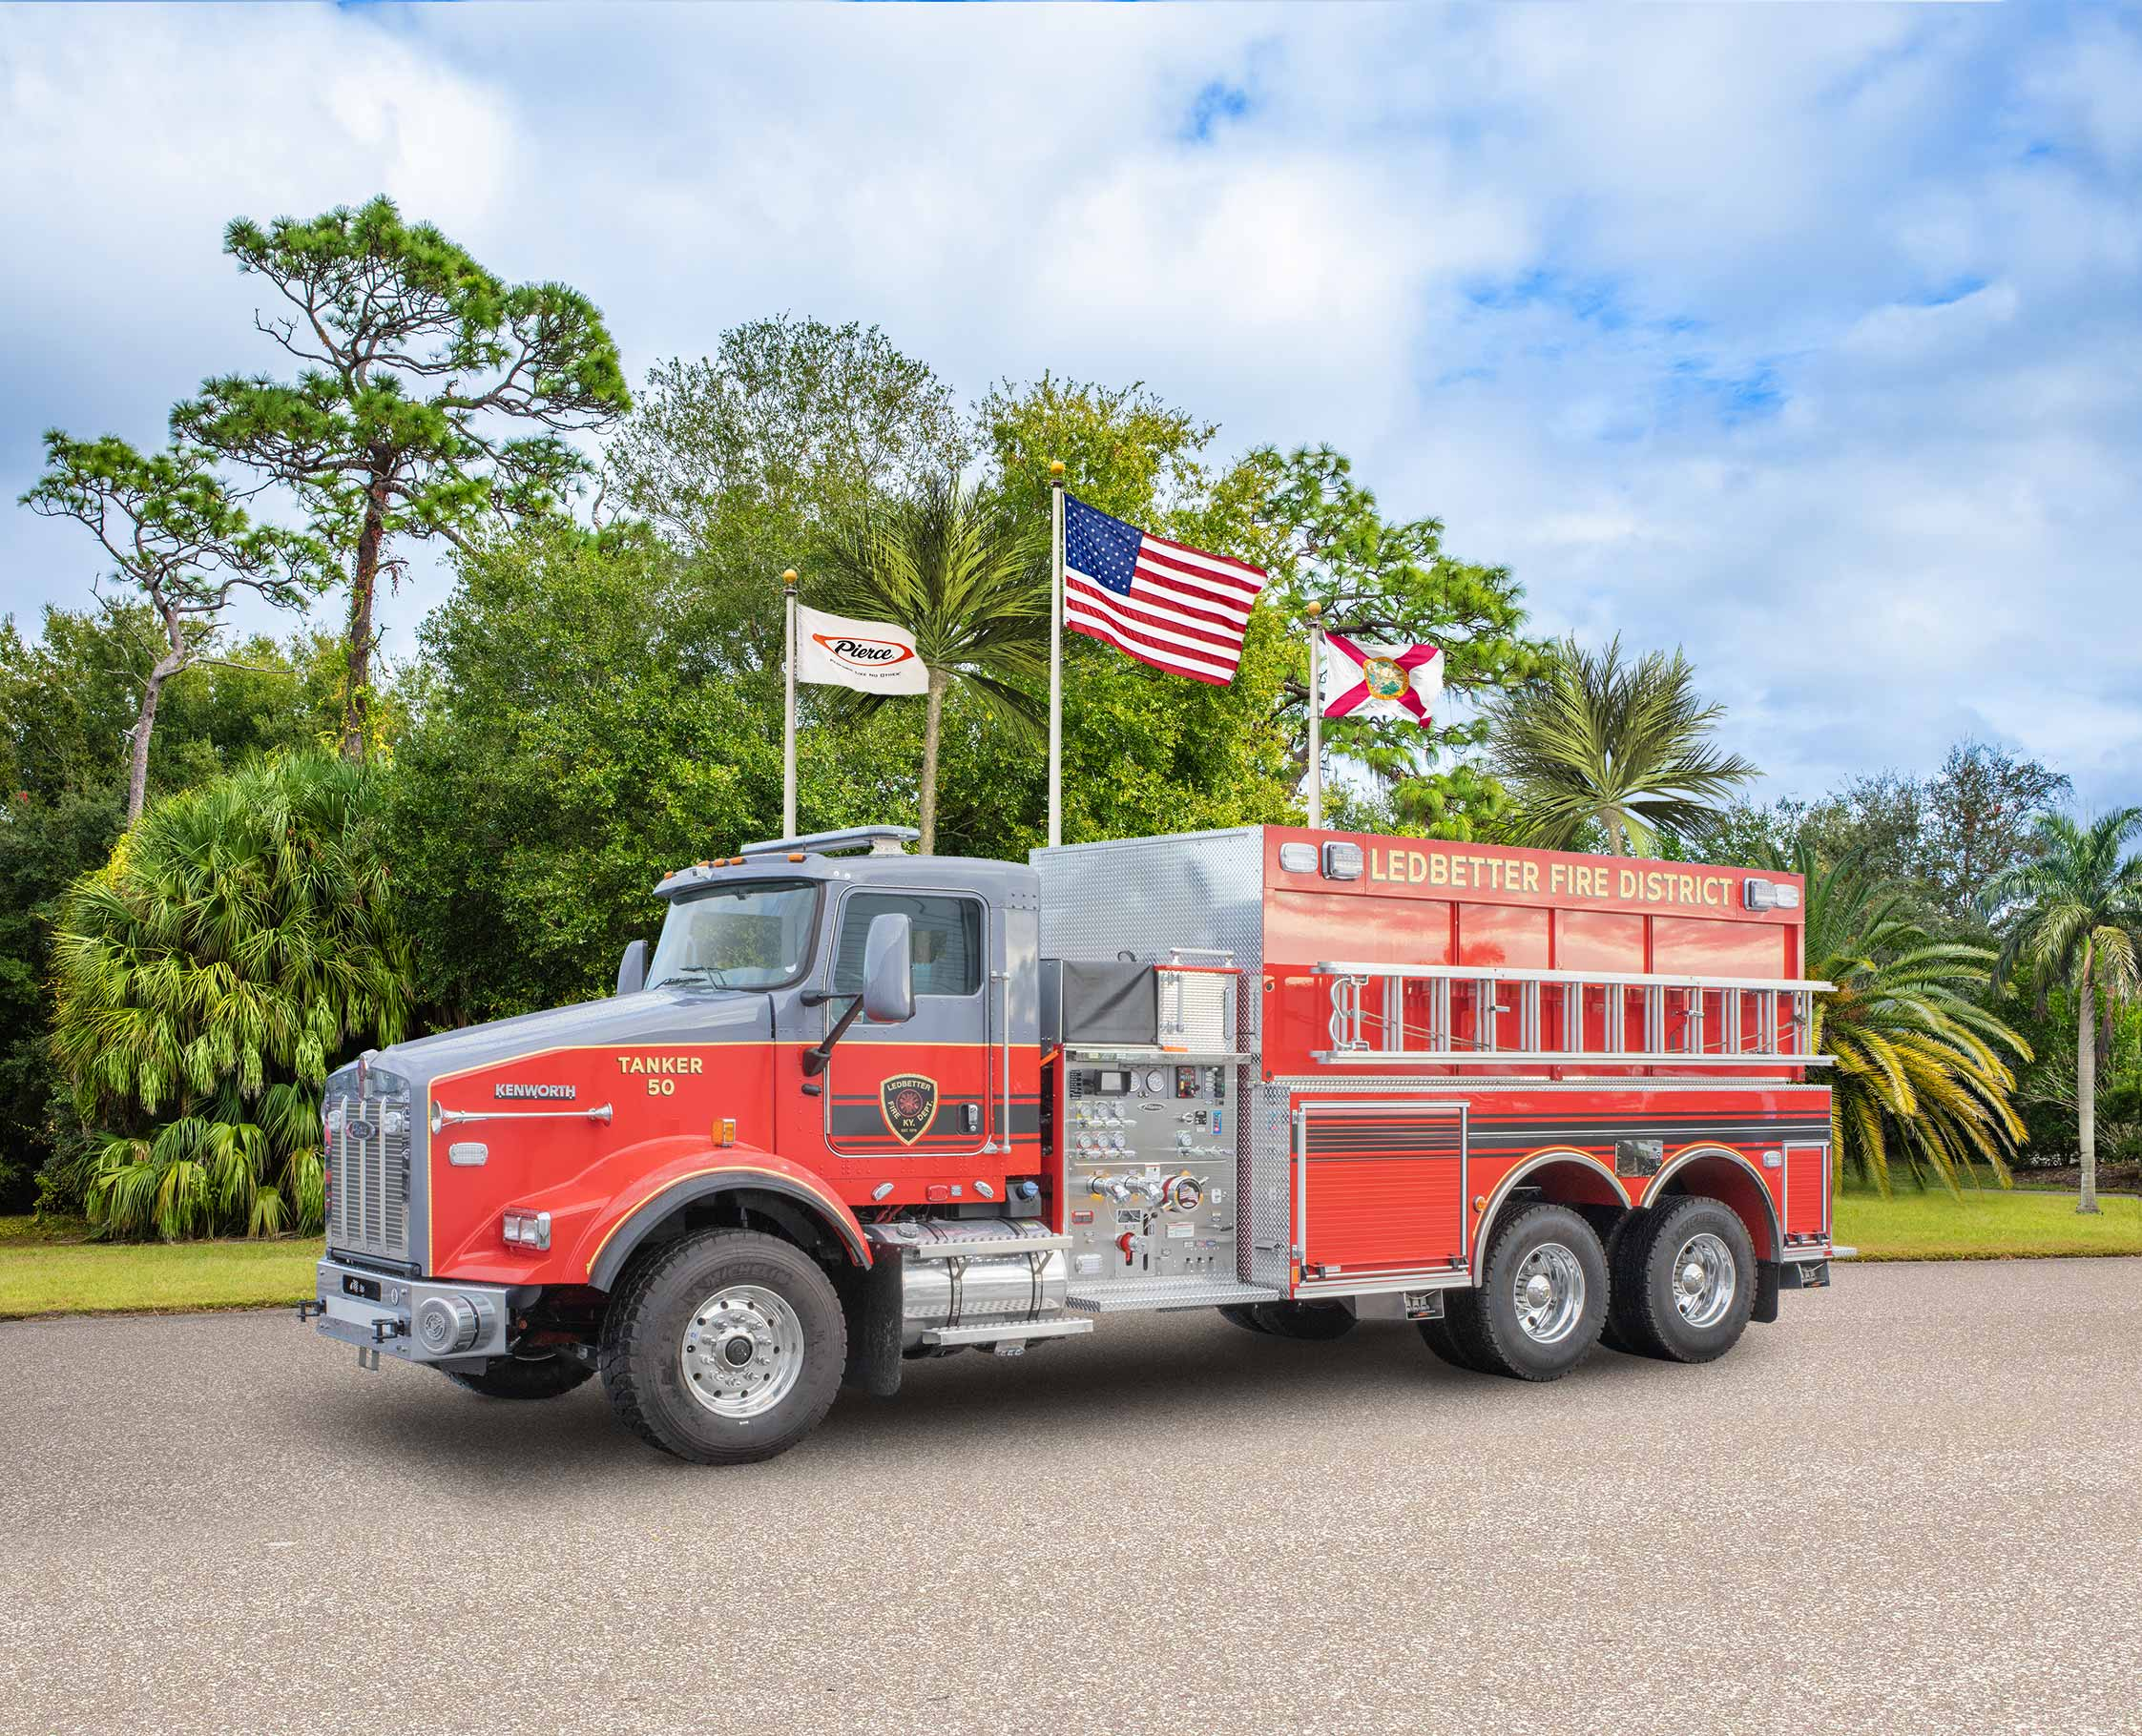 Ledbetter Fire District - Tanker